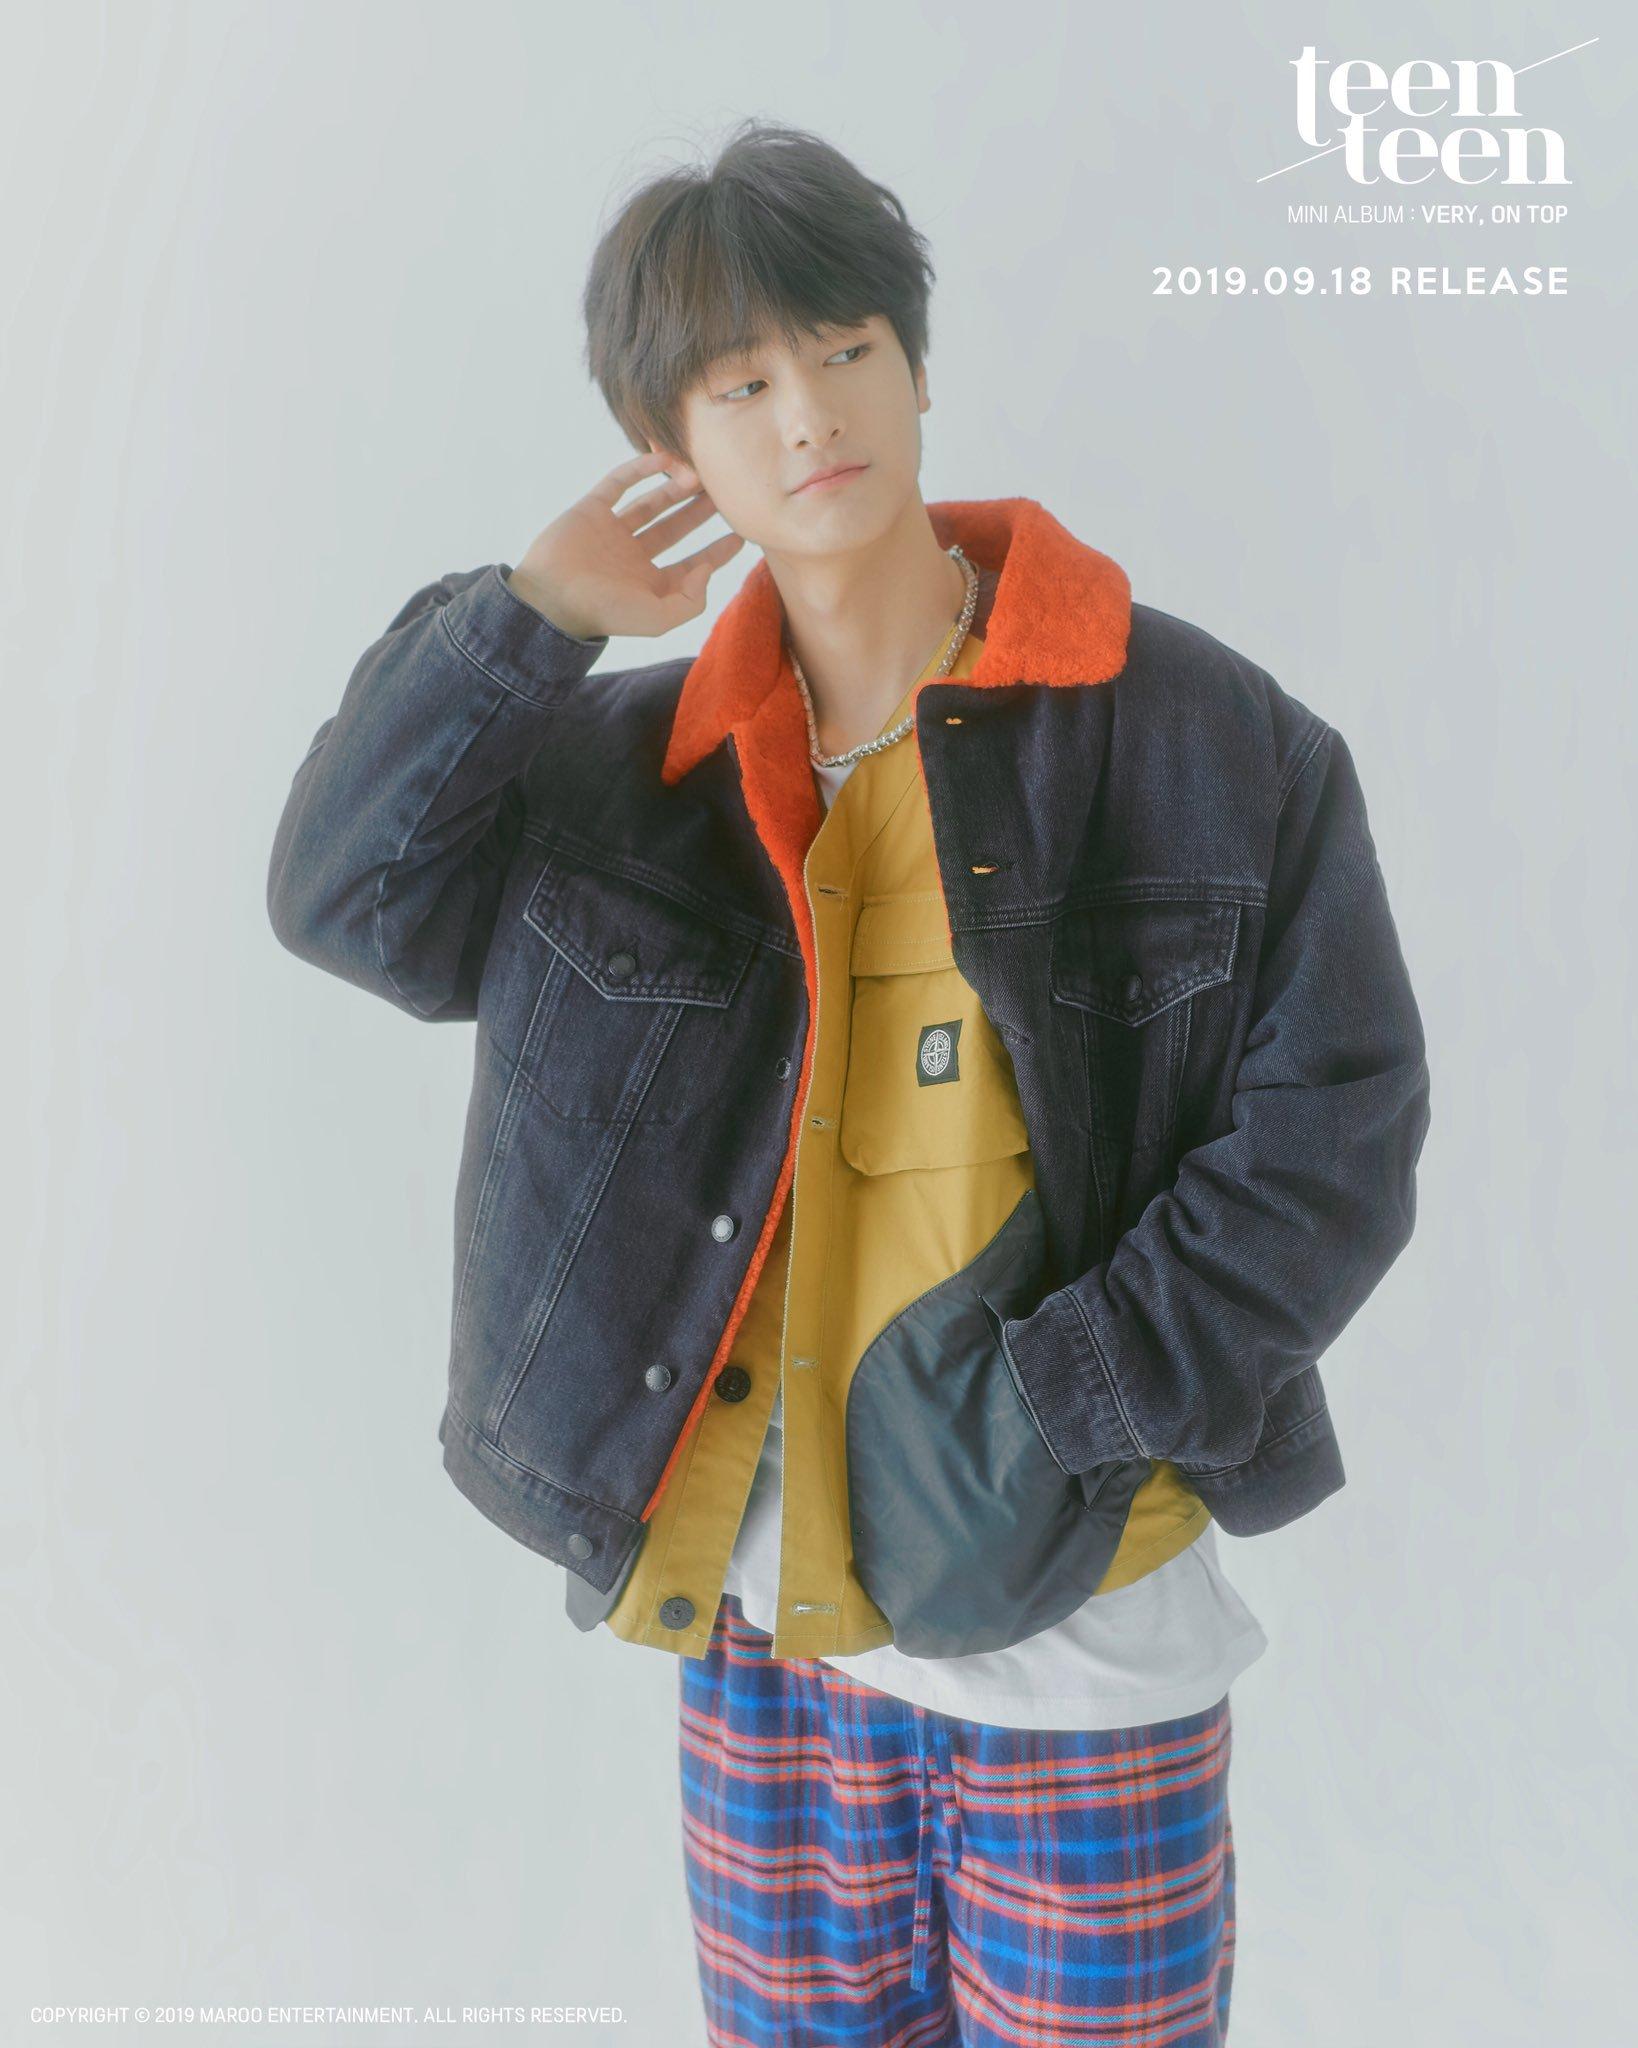 teen teen, teen teen members, teen teen height, teen teen age, teen teen facts, teen teen weight, teen teen debut, teen teen lee woojin, lee woojin